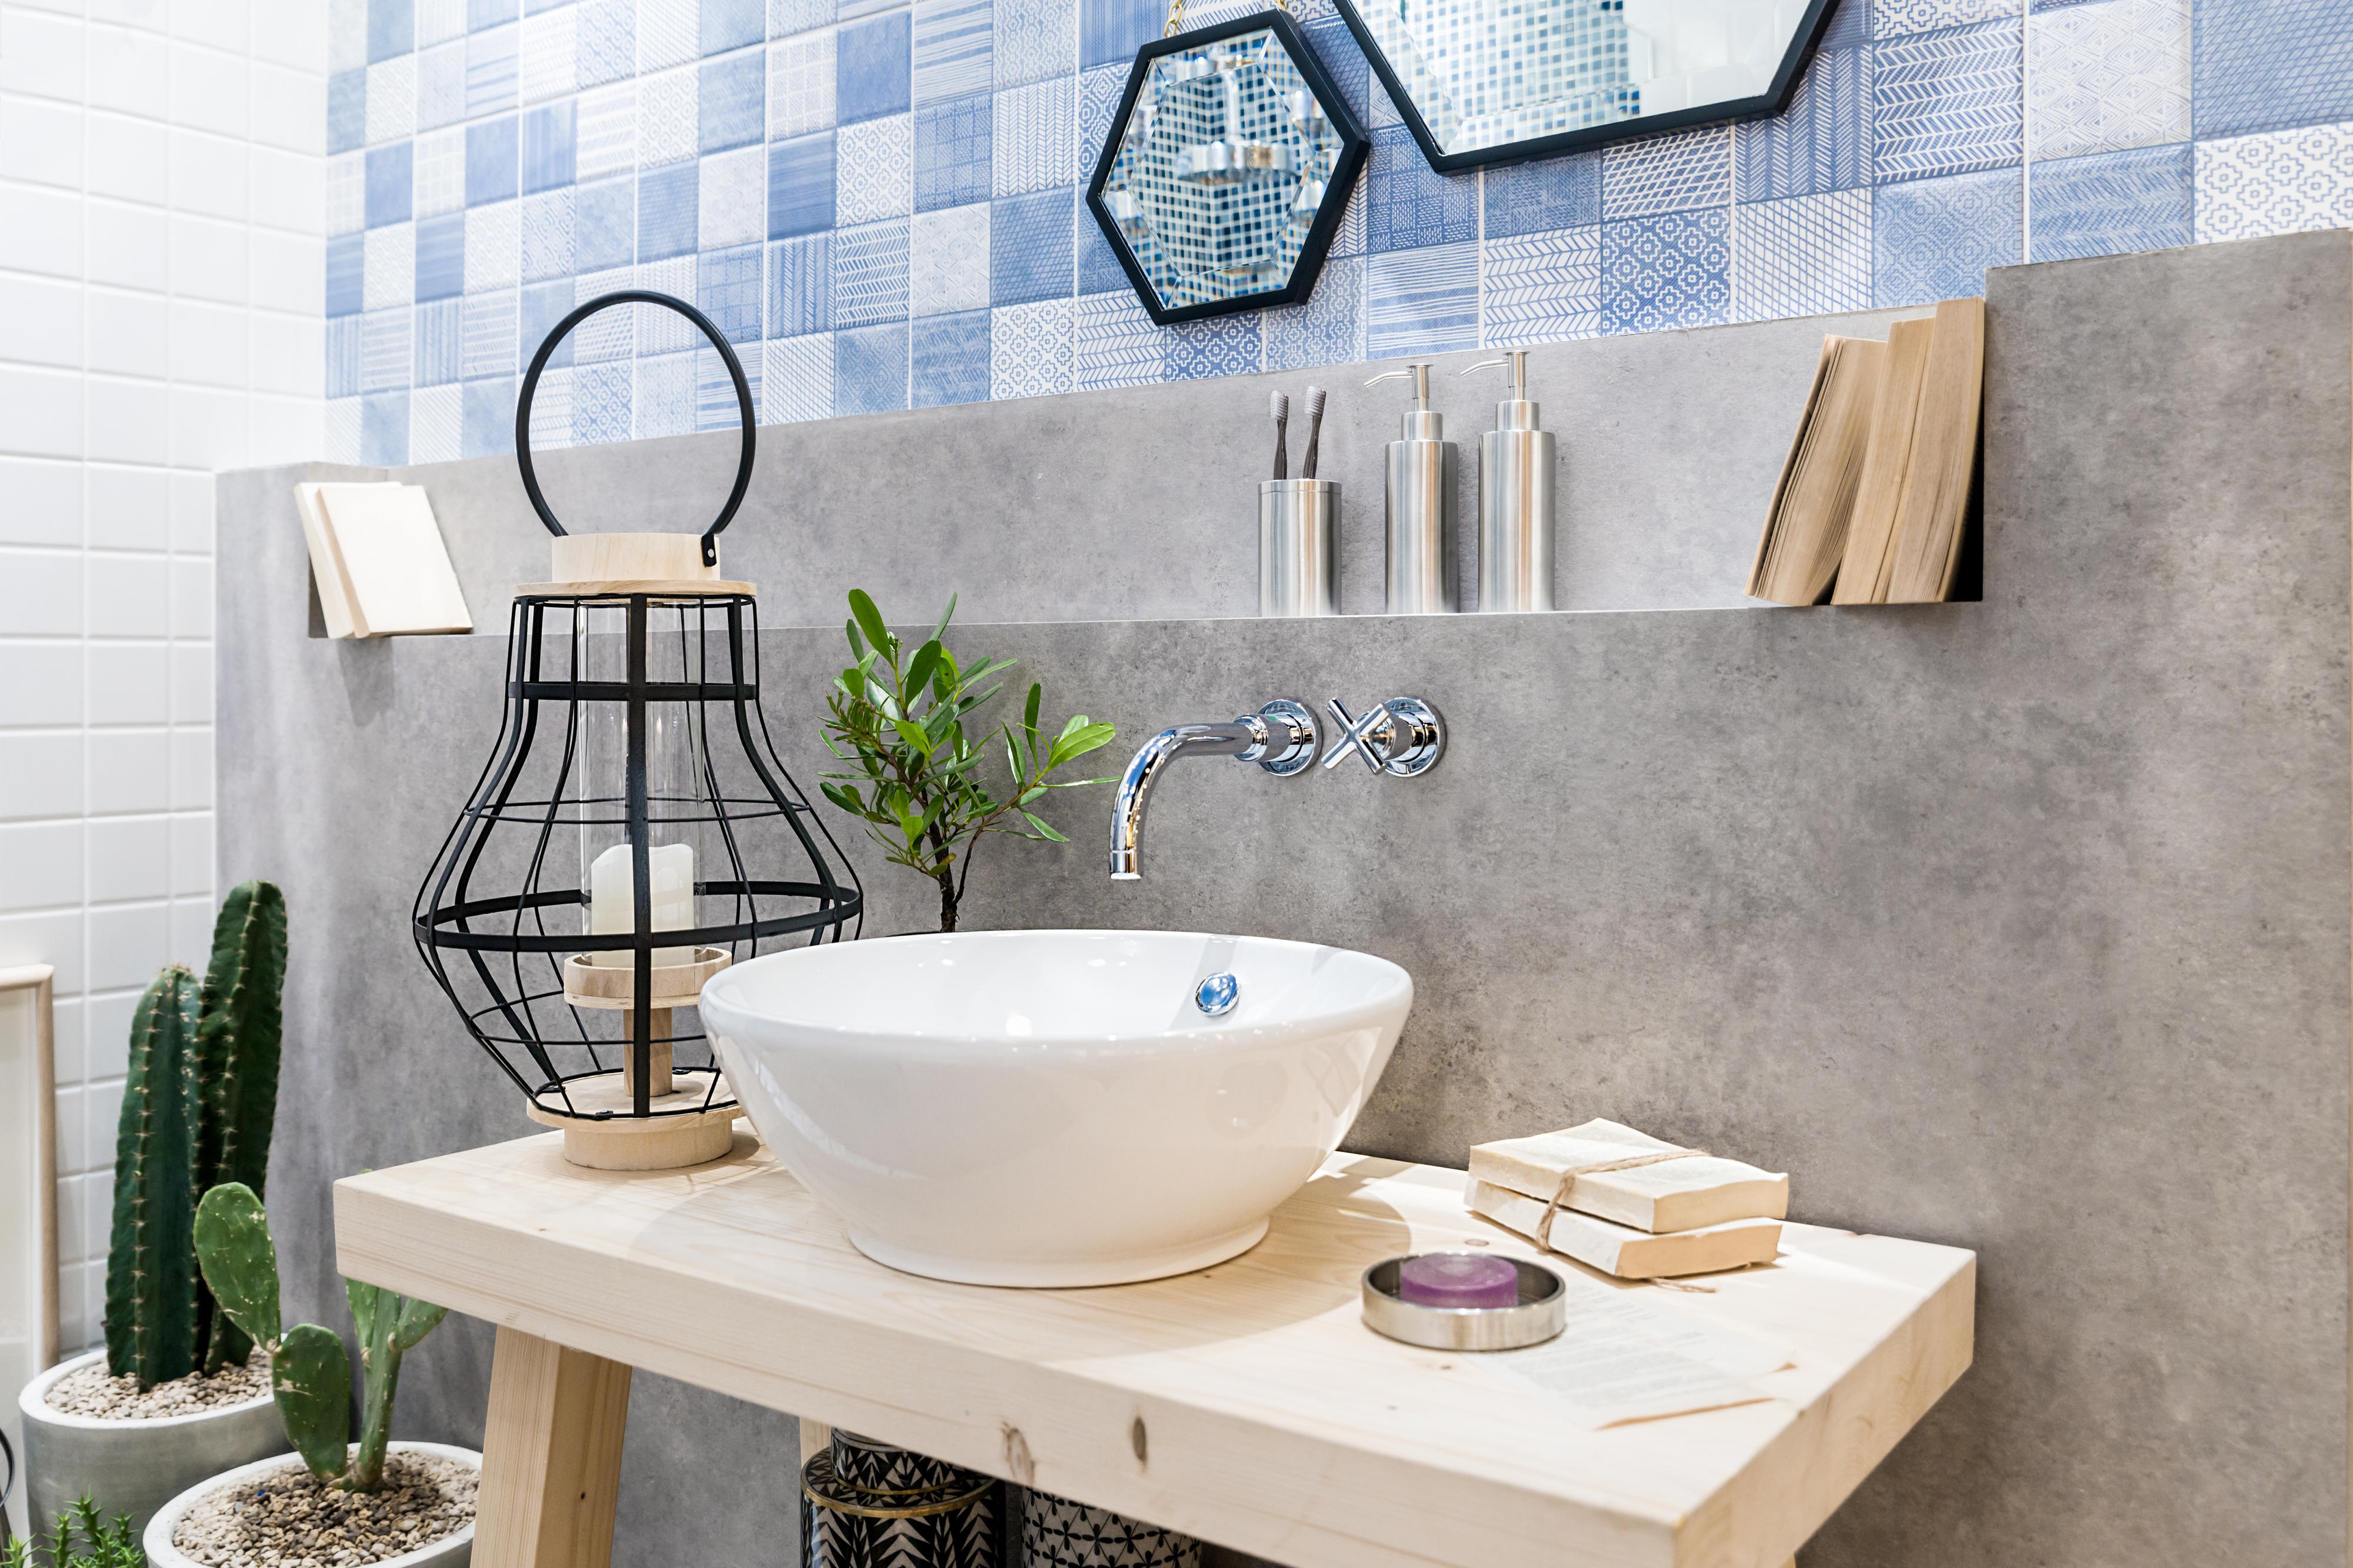 Badezimmer Deko Ideen Zum Wohlfuhlen Brigitte De